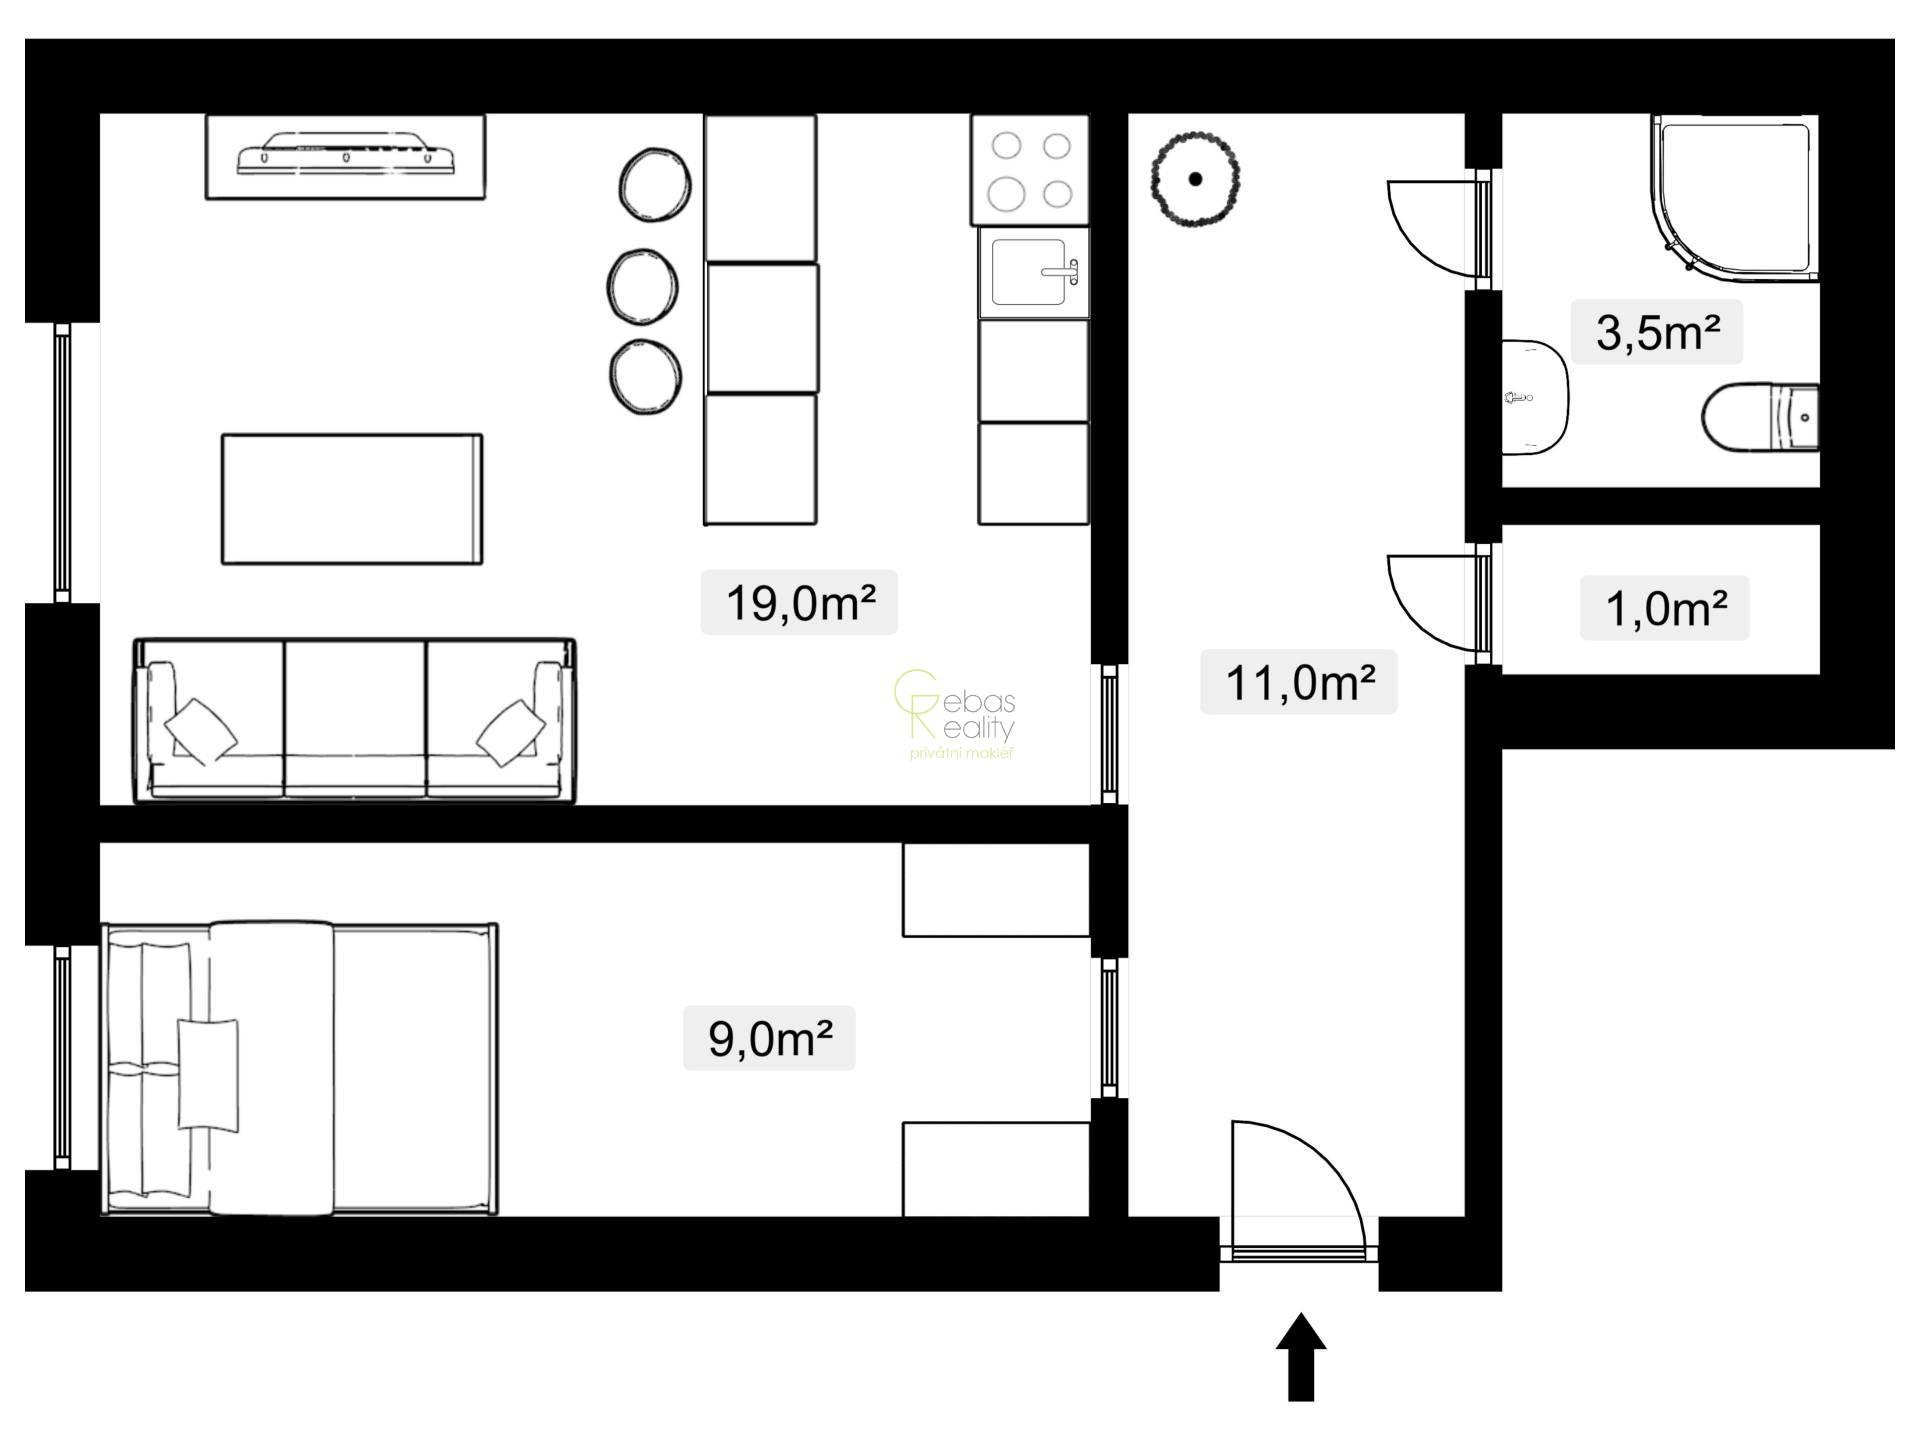 Pronájem bytu 2+kk - ul.Branická, Praha 4 - Braník